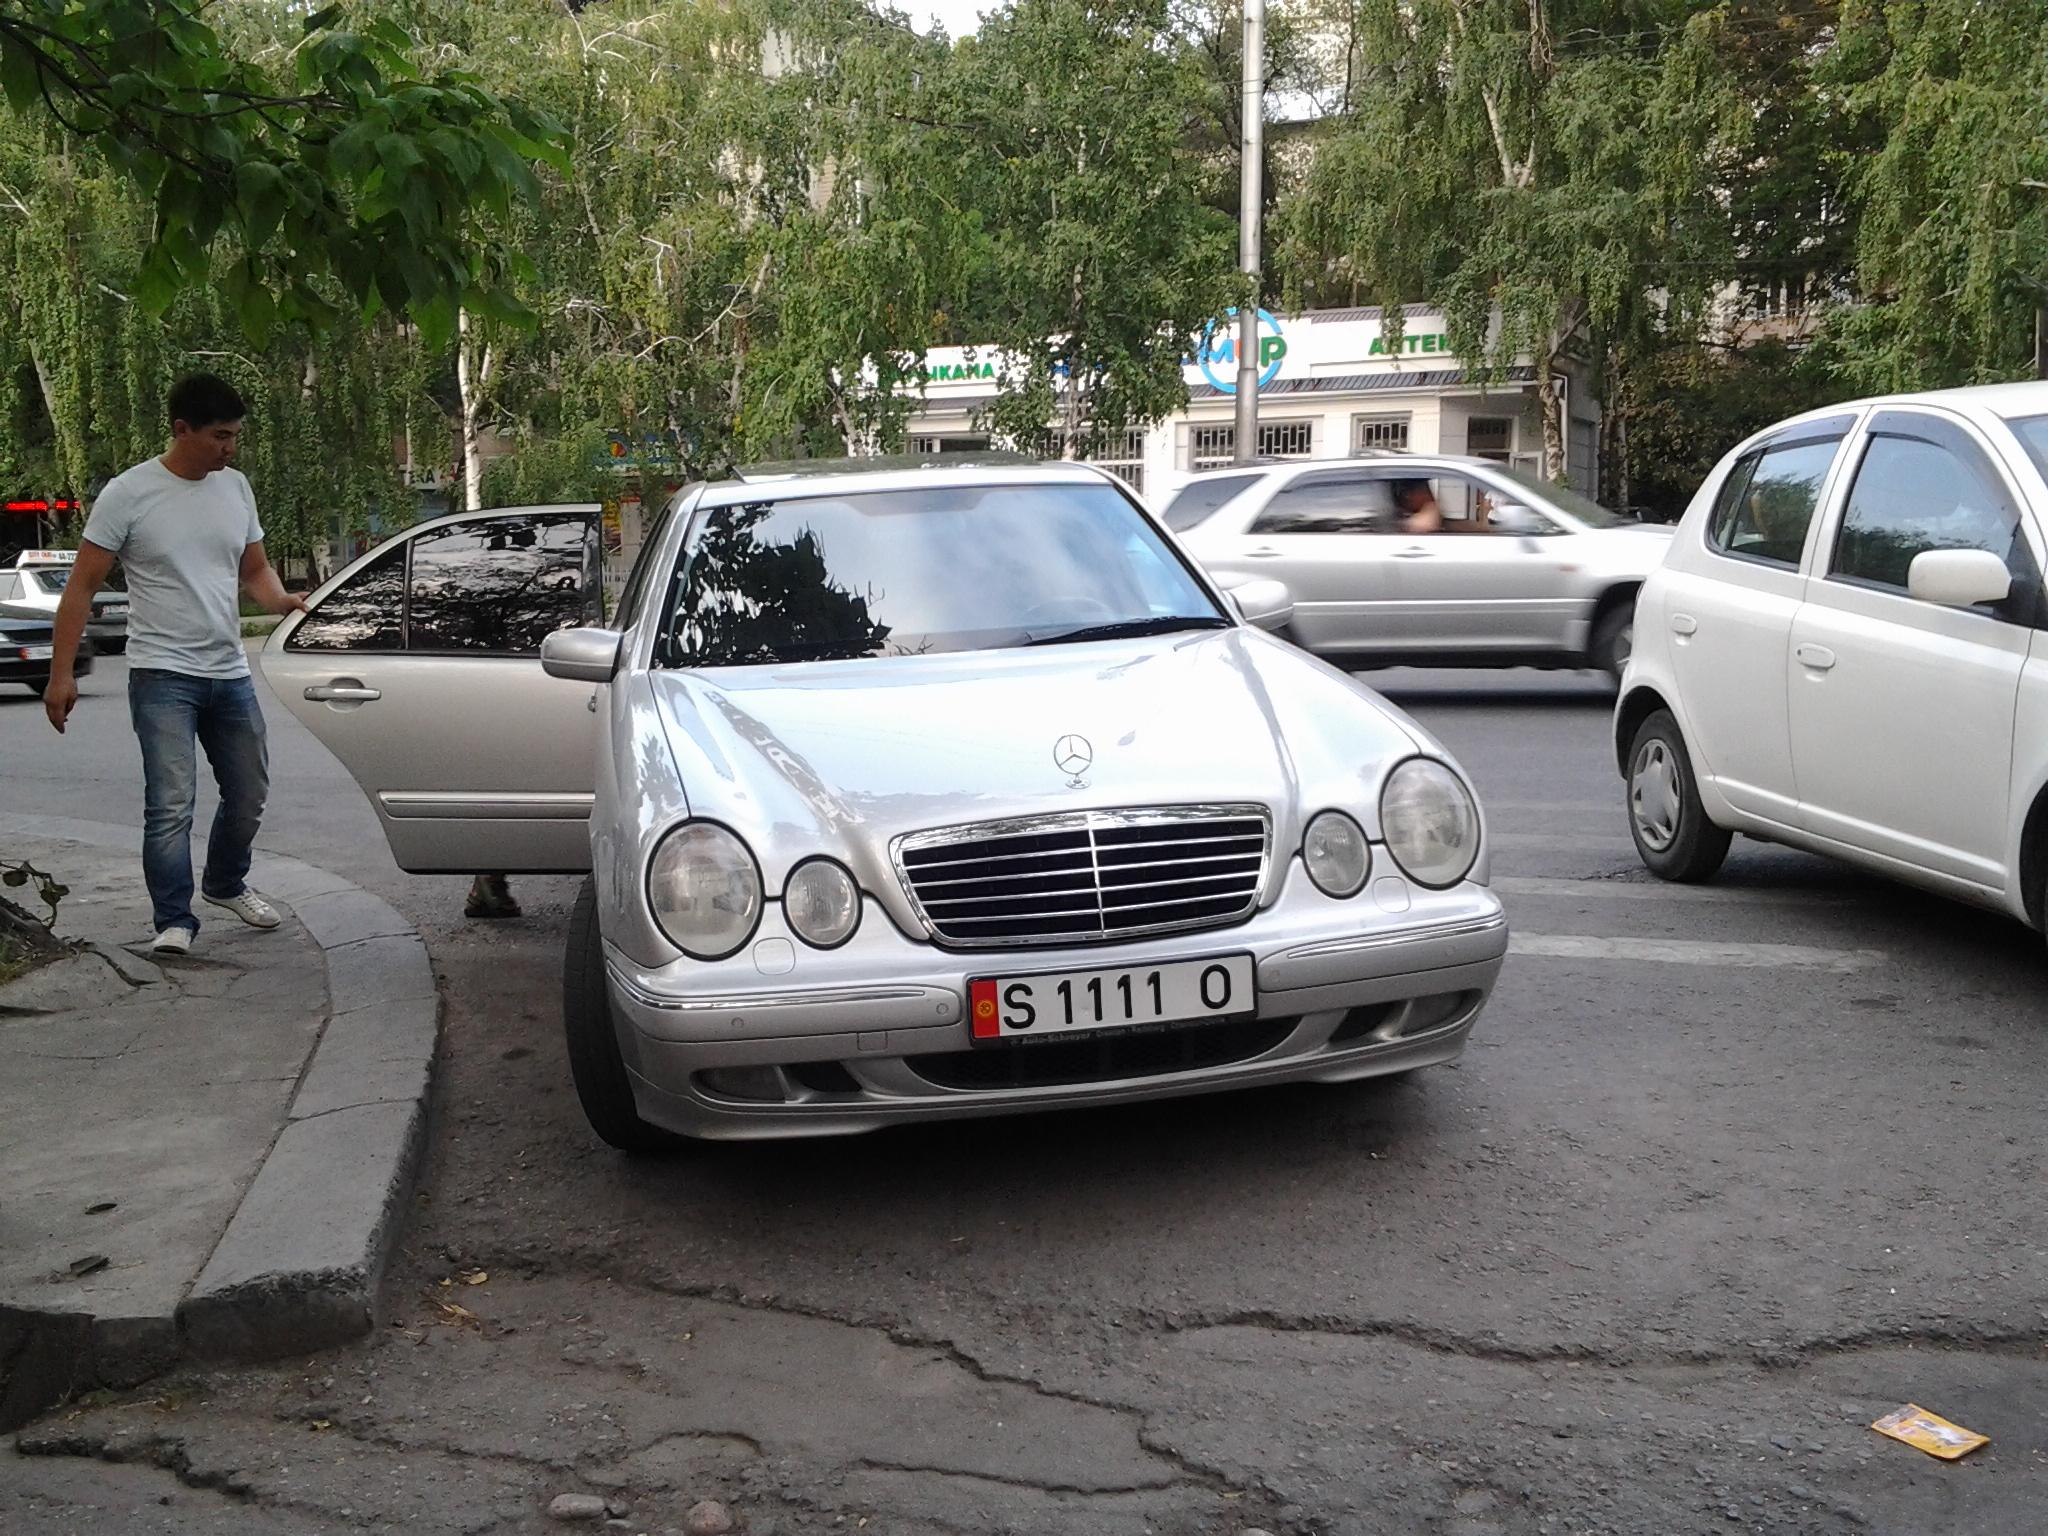 Крутые номера на машину фото: http://genautof.ru/post.php?id=19448